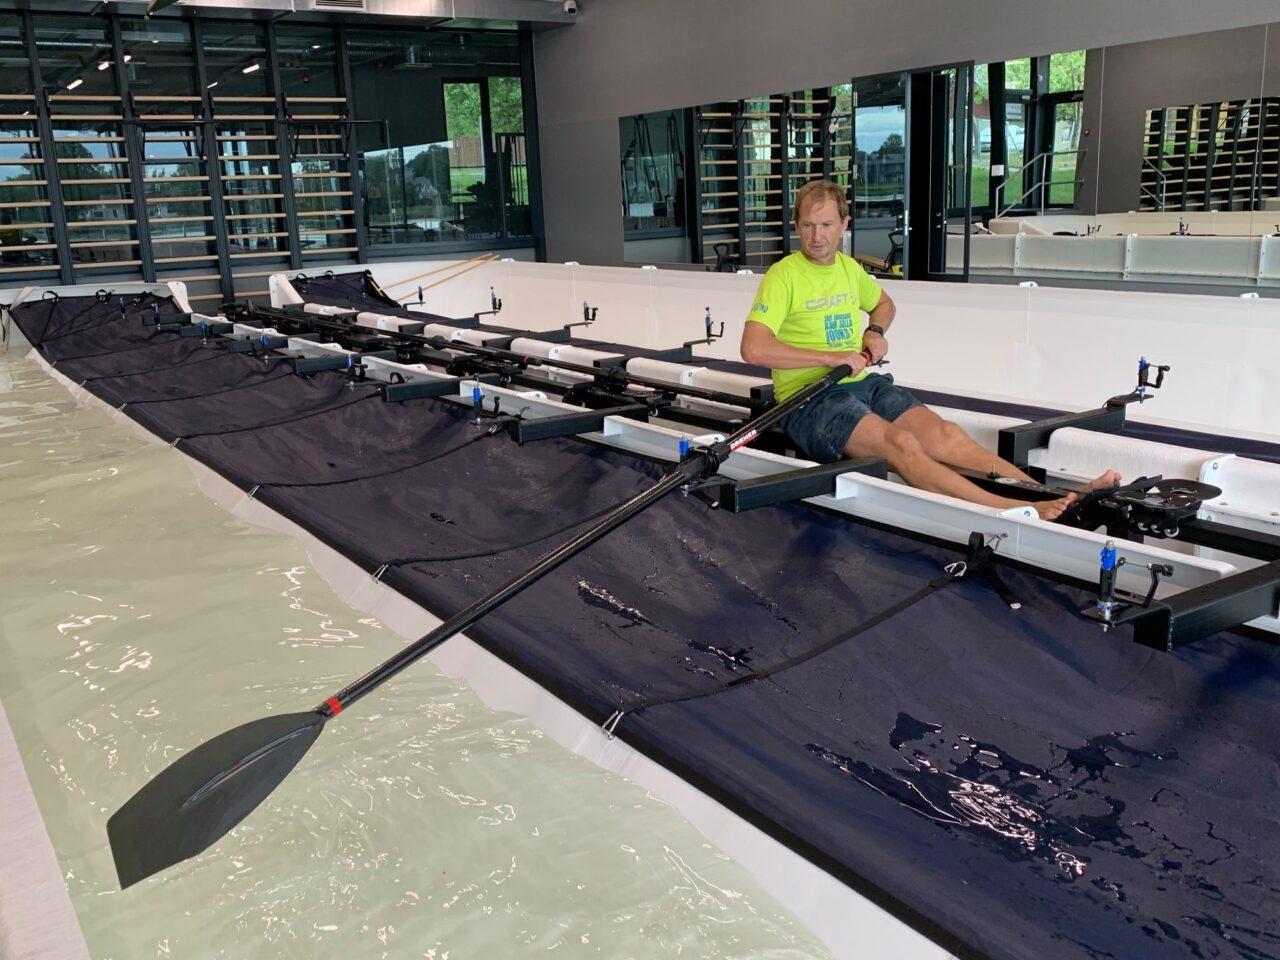 https://www.rowing.ee/wp-content/uploads/2020/12/Taiskasvanute-rubriiki-Juri-Jaanson-klubi-FB-1280x960.jpg